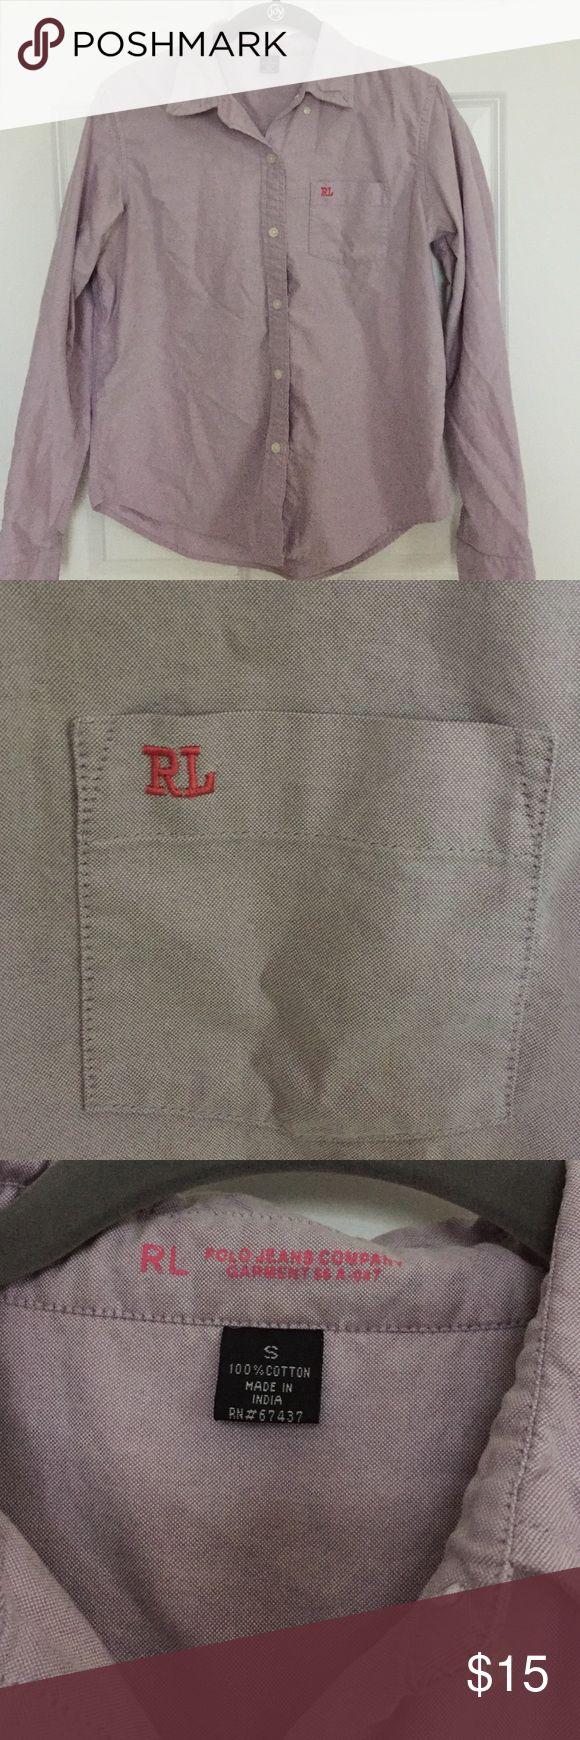 Women's Ralph Lauren button down shirt EUC women's button down shirt Ralph Lauren Tops Button Down Shirts